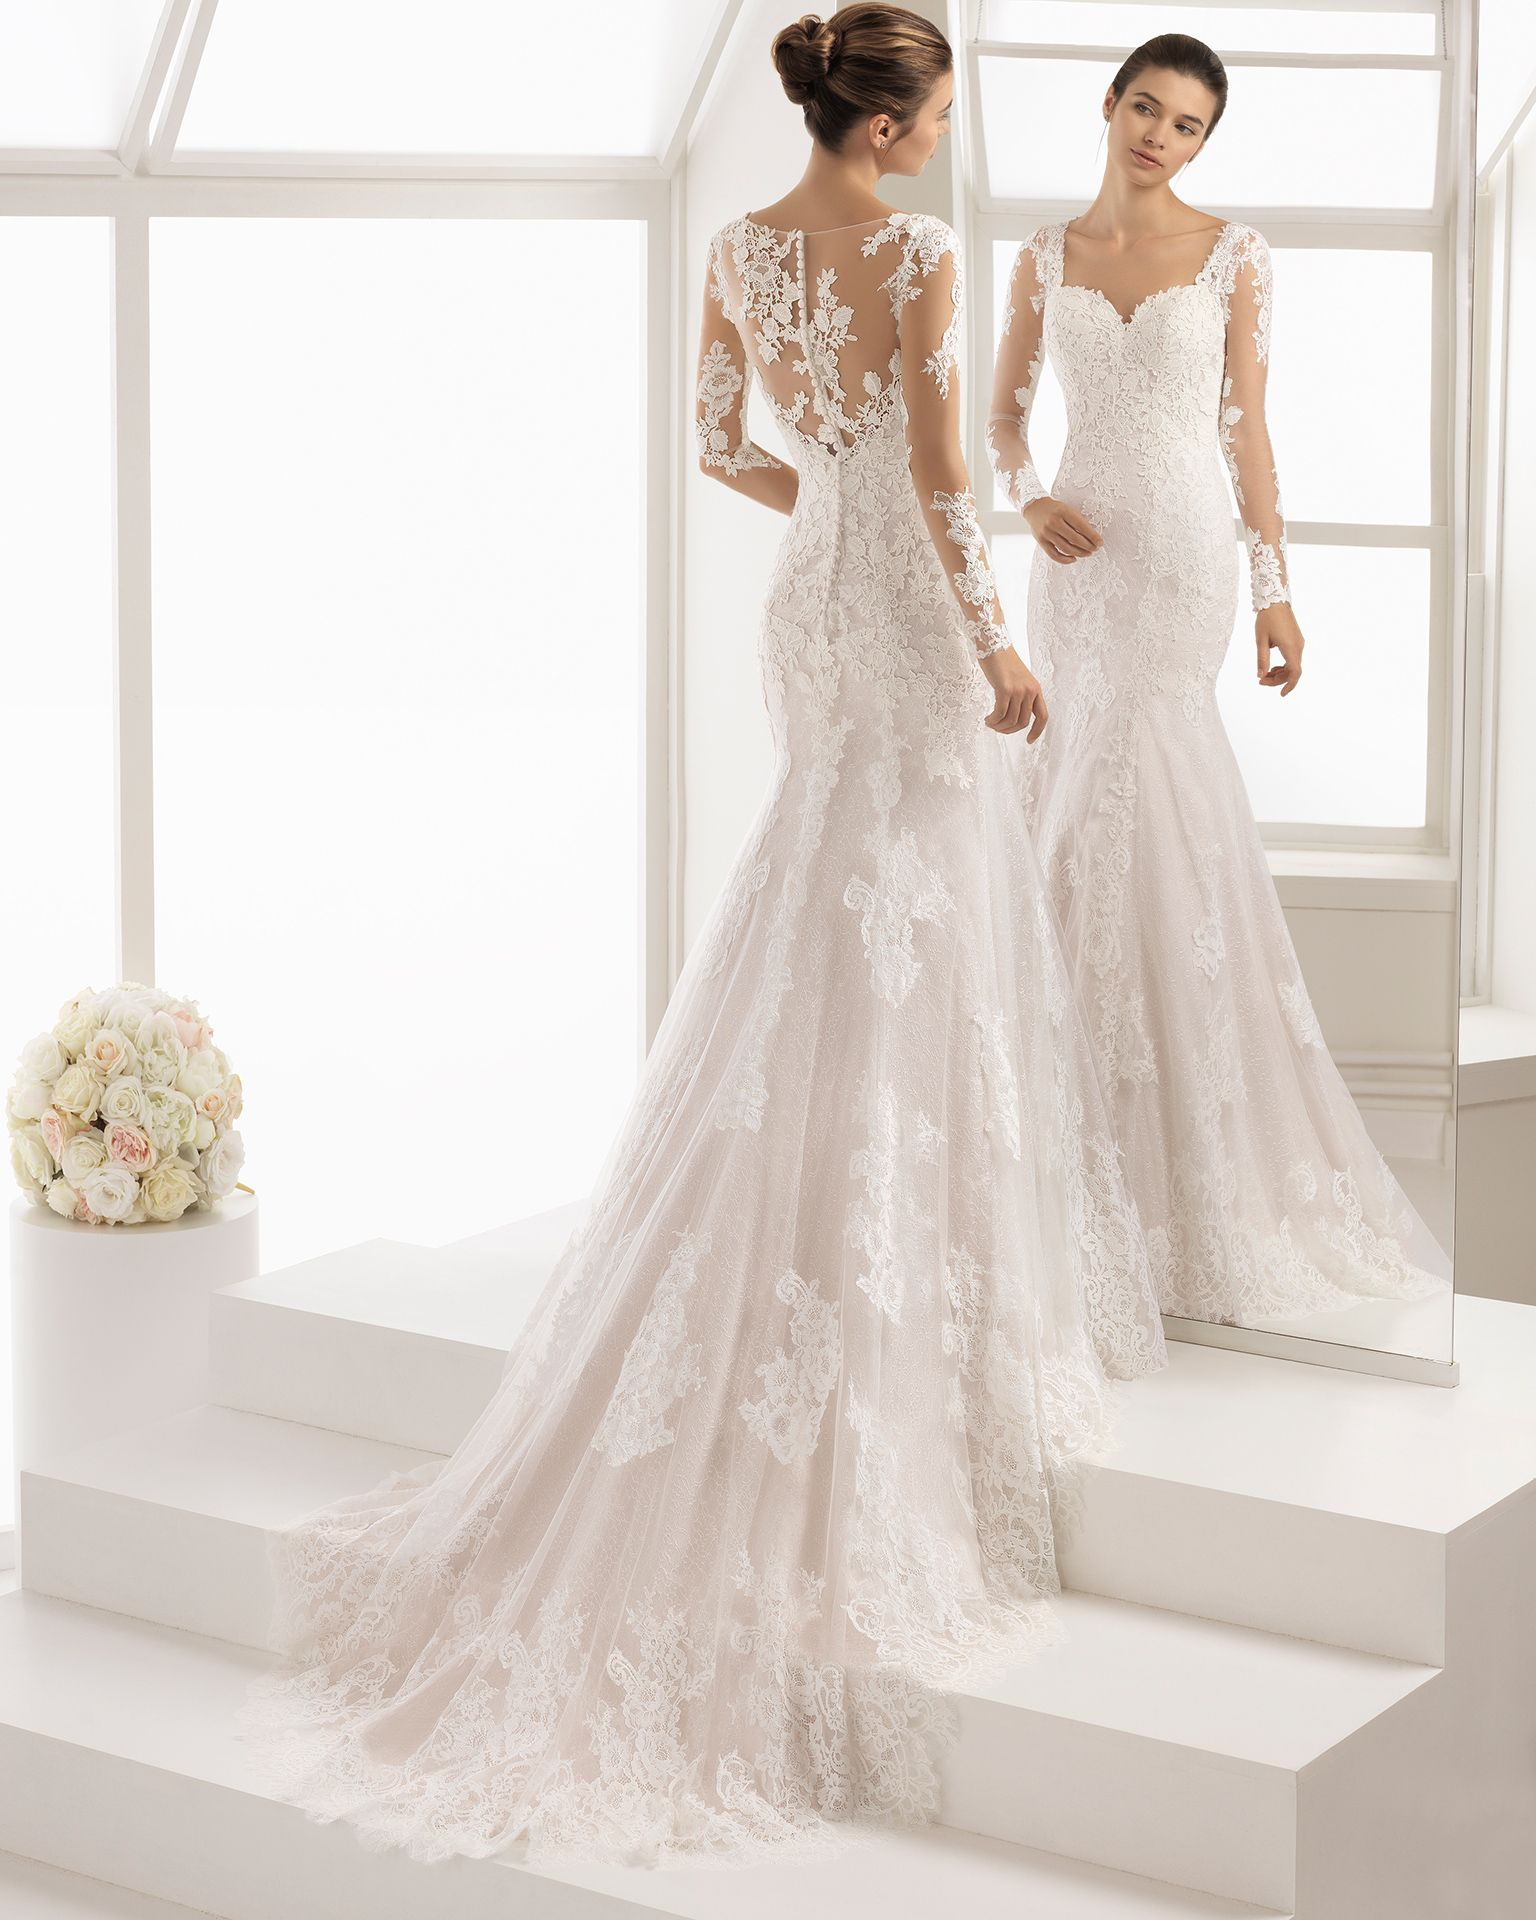 Vestido de novia estilo romántico en encaje y guipur con manga larga ...